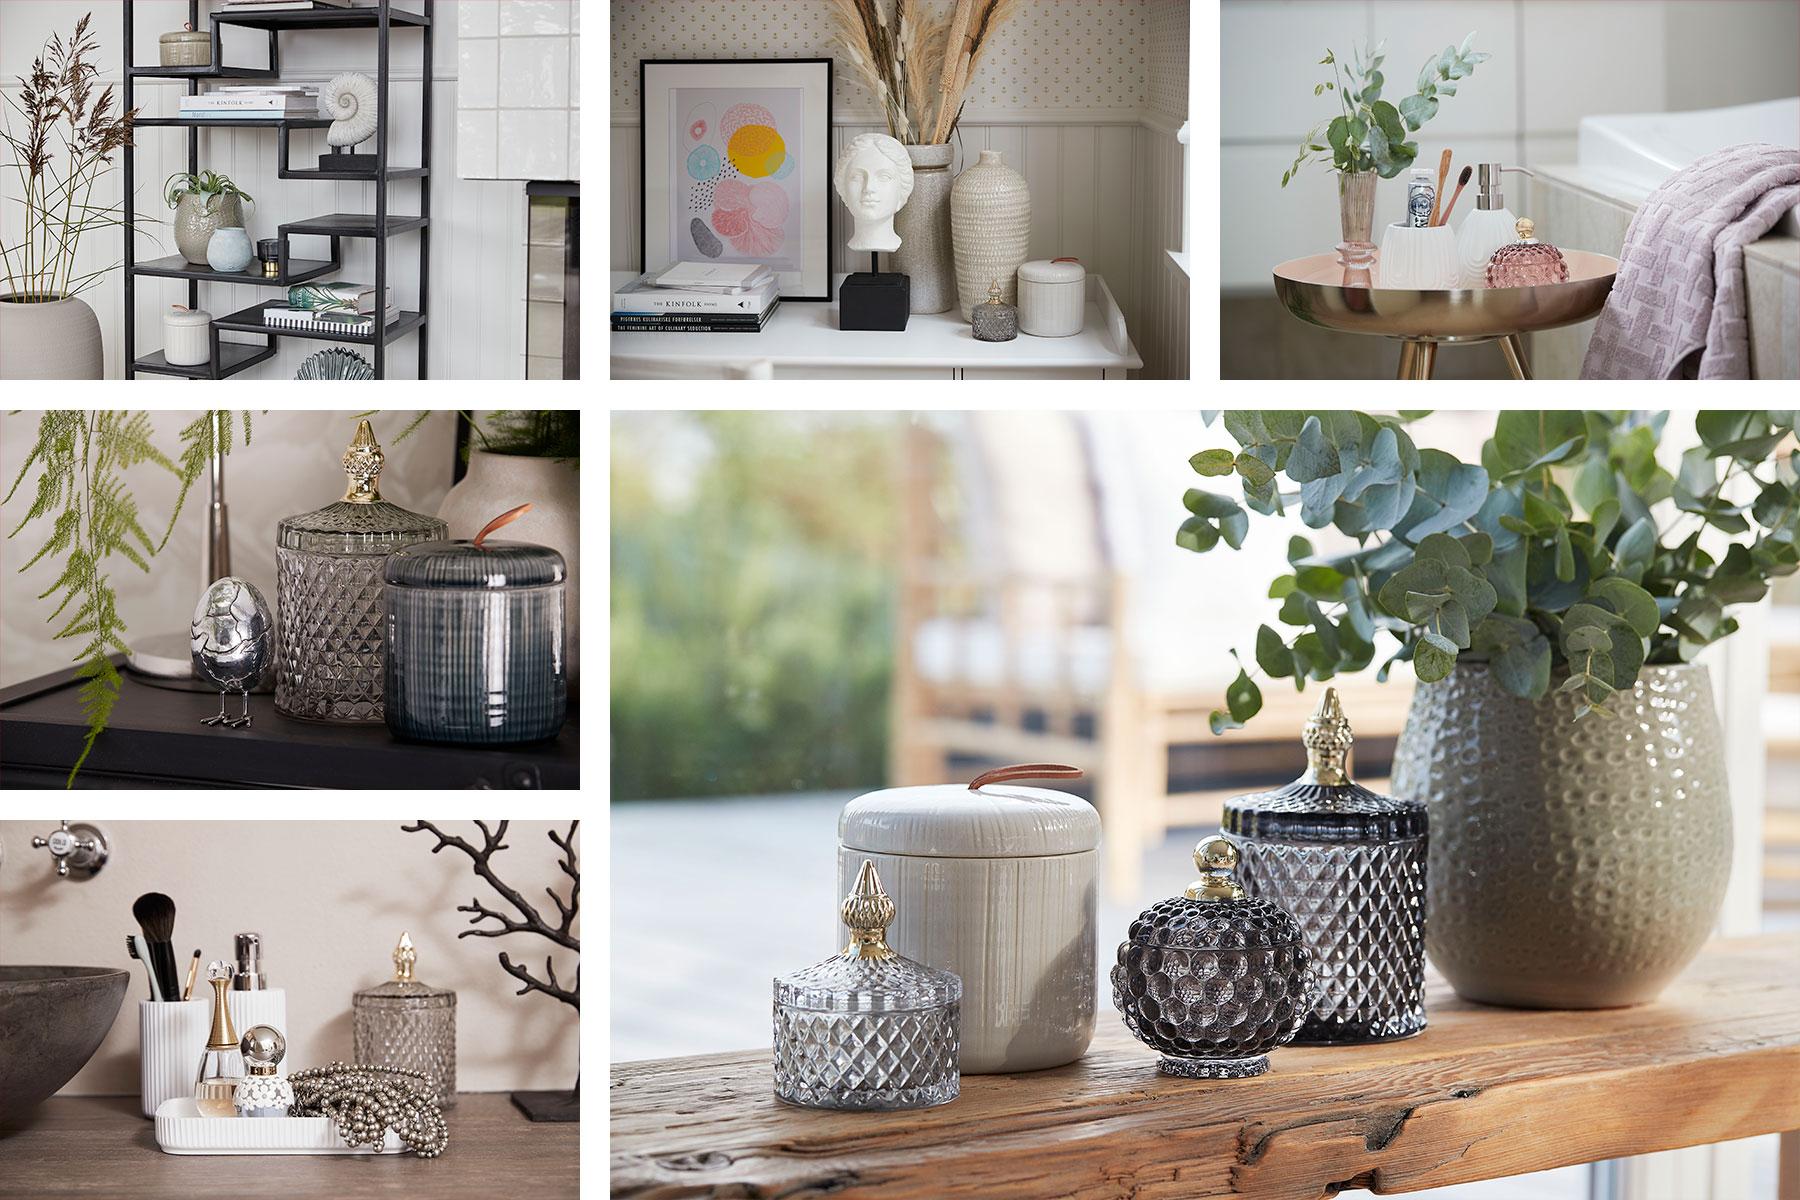 Glass and ceramic jars from scandinavian wholesaler Lene Bjerre